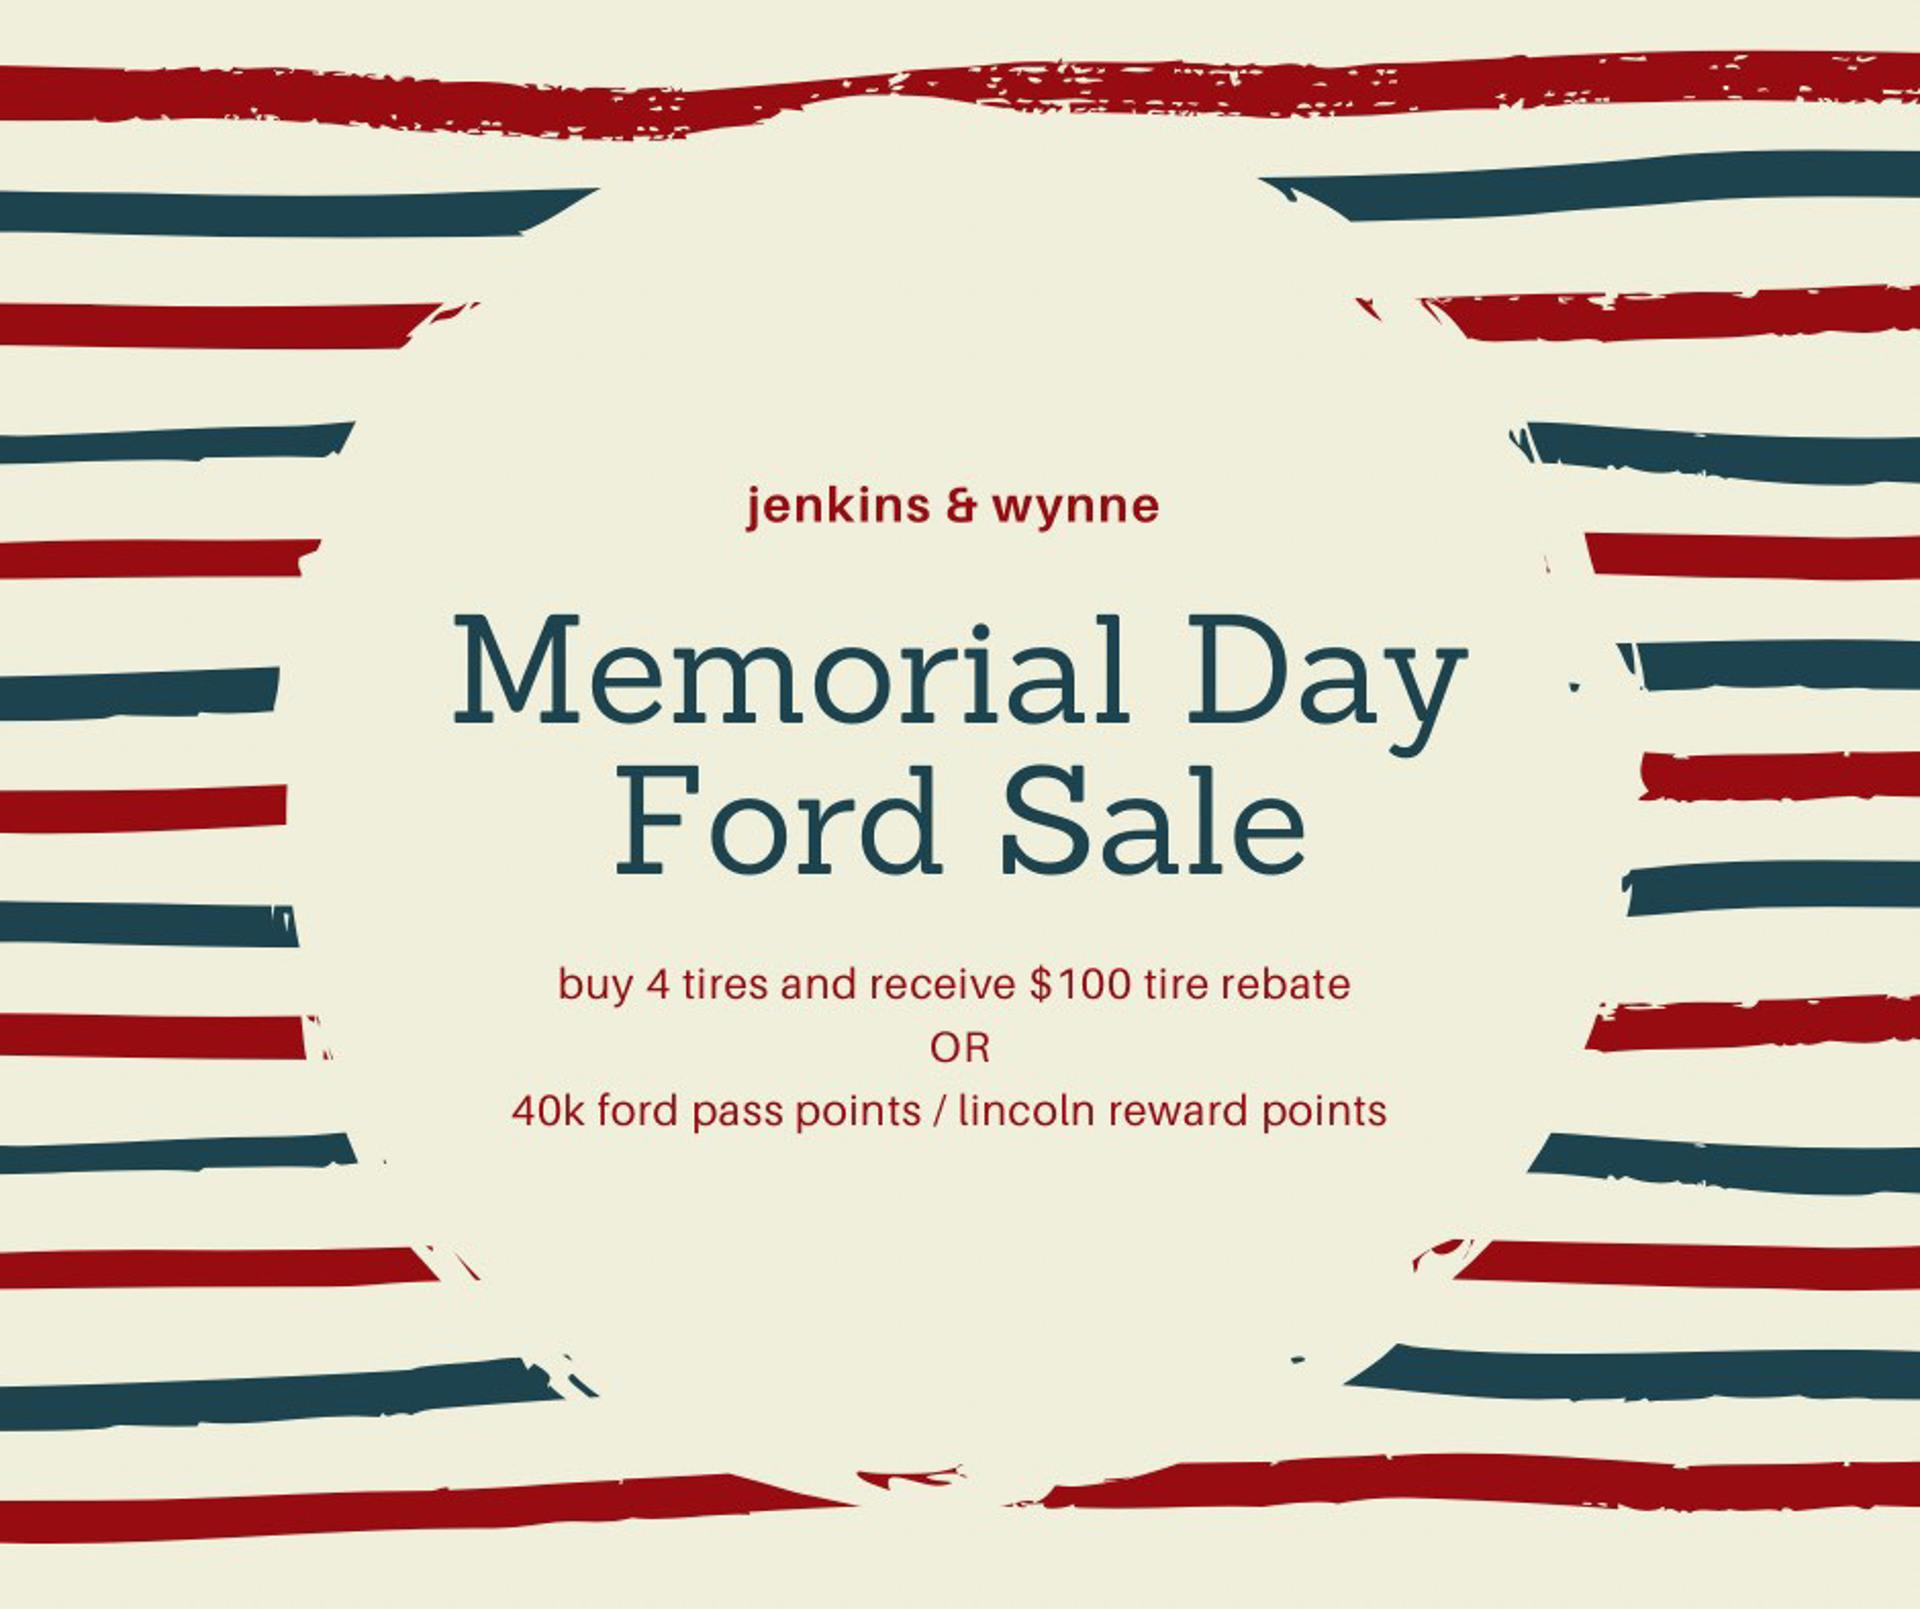 Memorial Day Tire Offer!